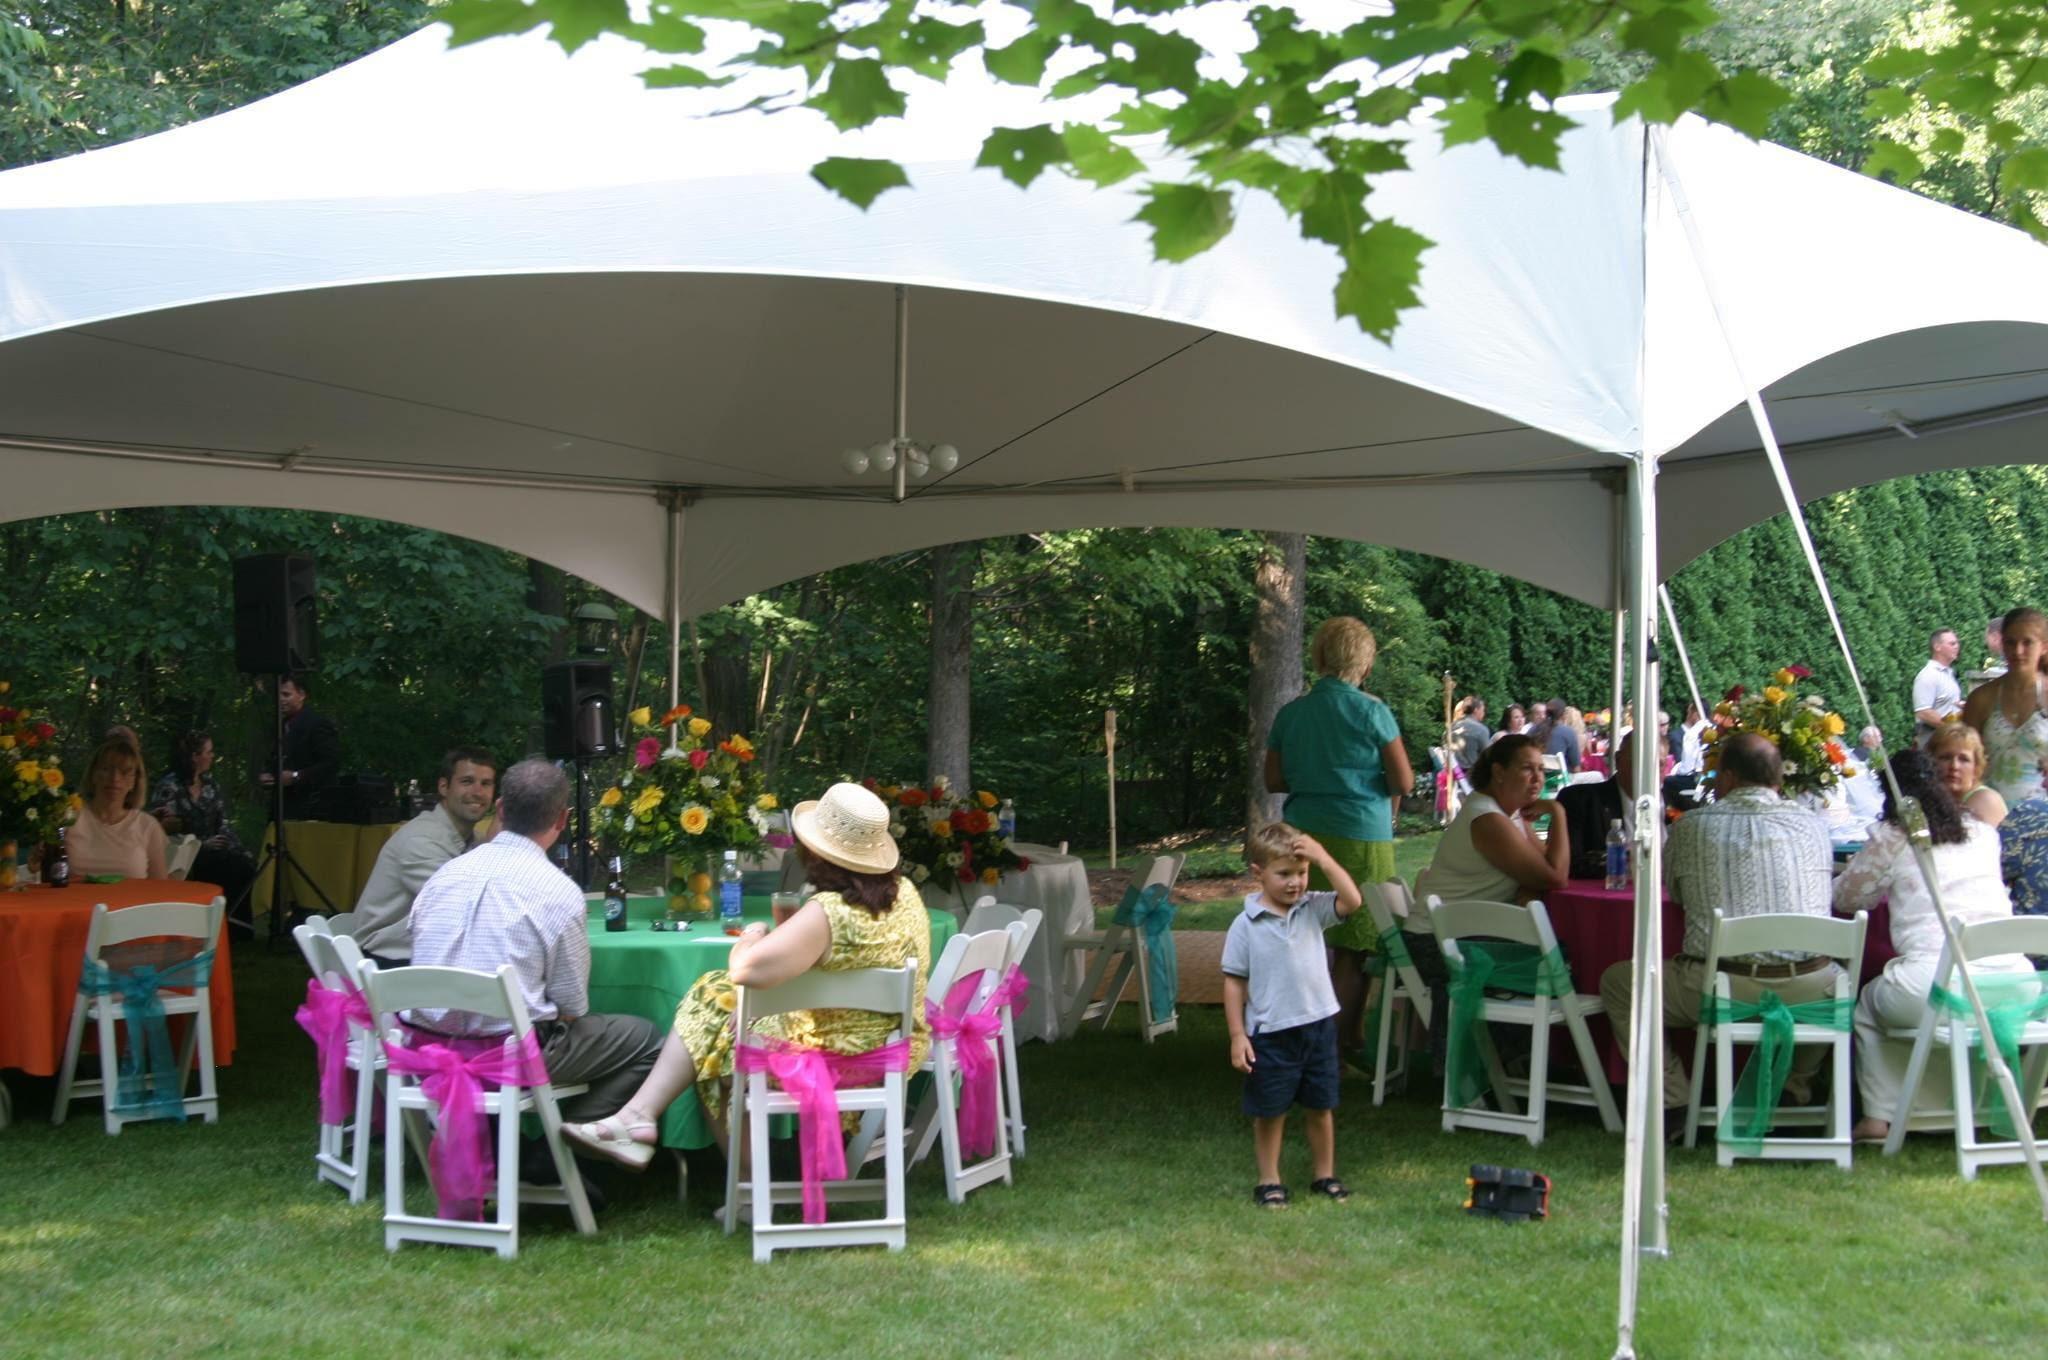 pittsburgh-tent-wedding-10.jpg